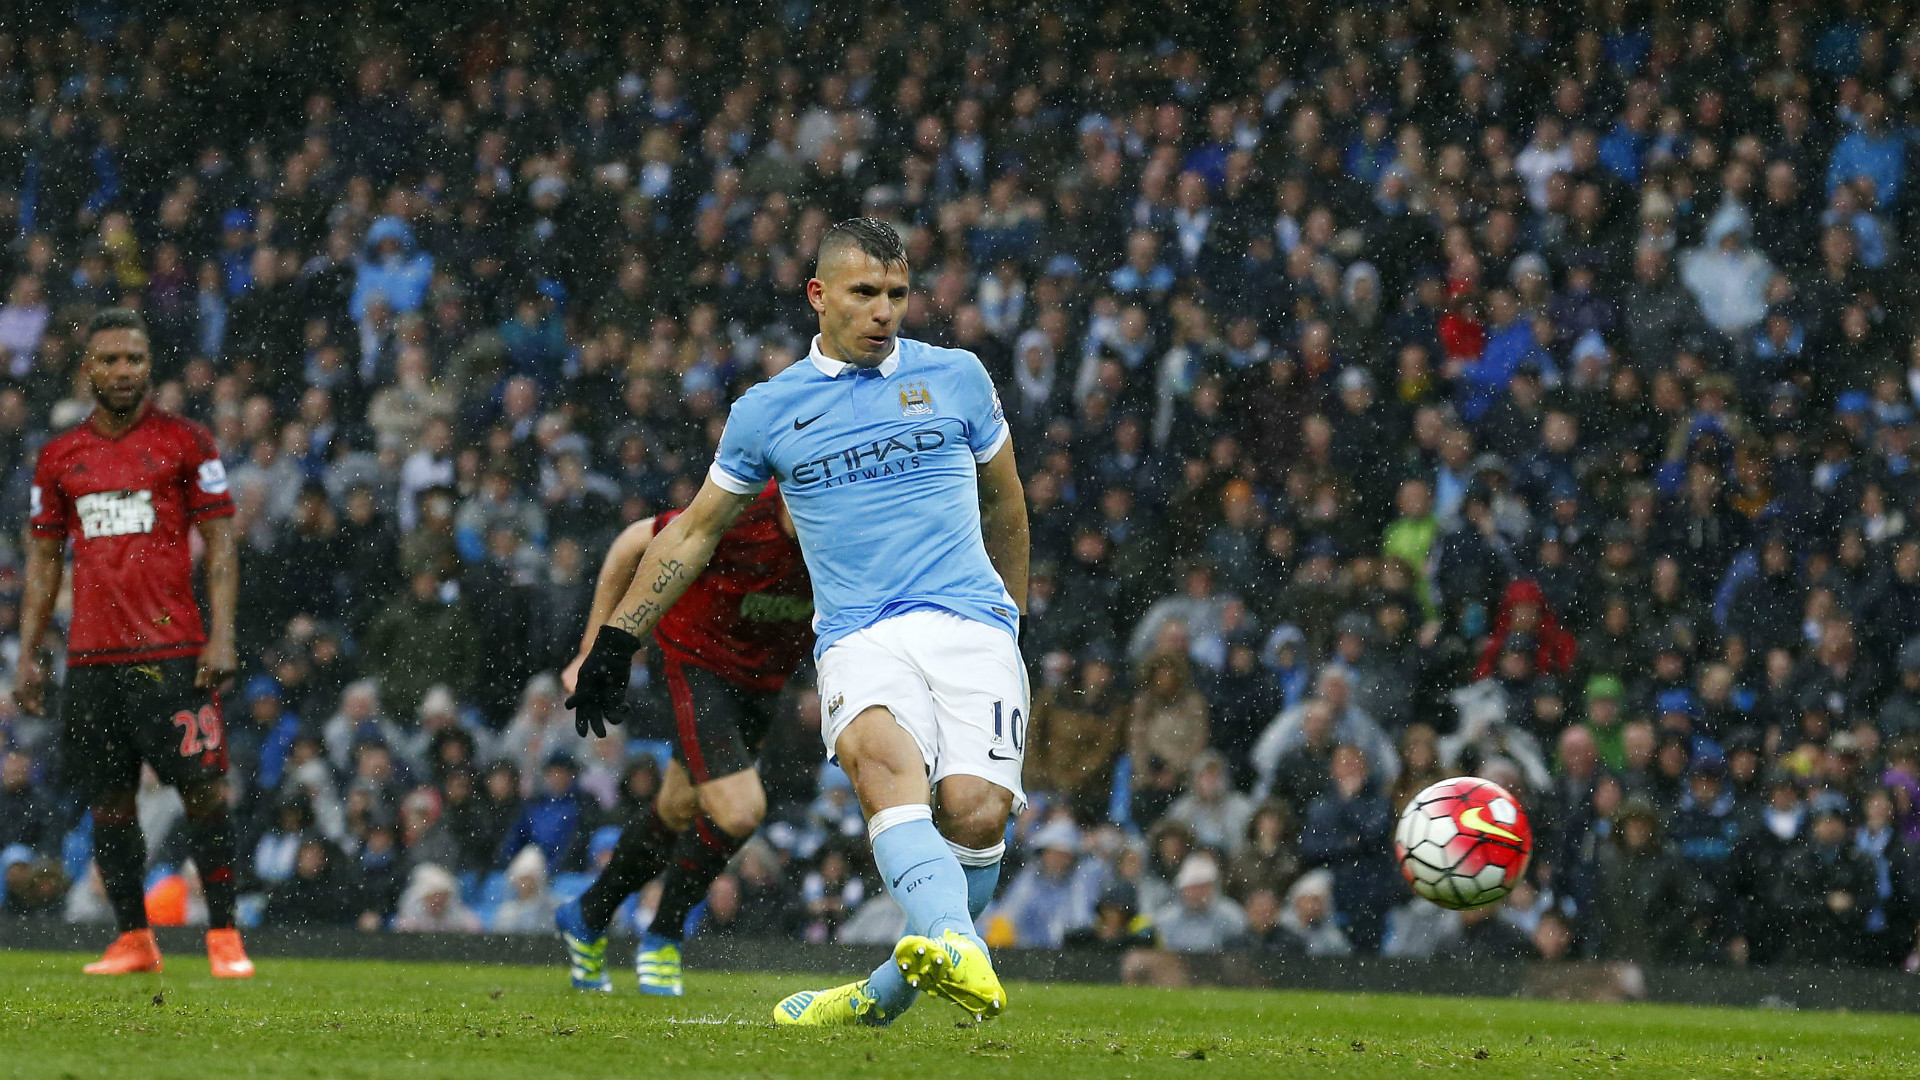 Man City Target Win Vs West Brom, Pellegrini Still Chasing Top-4